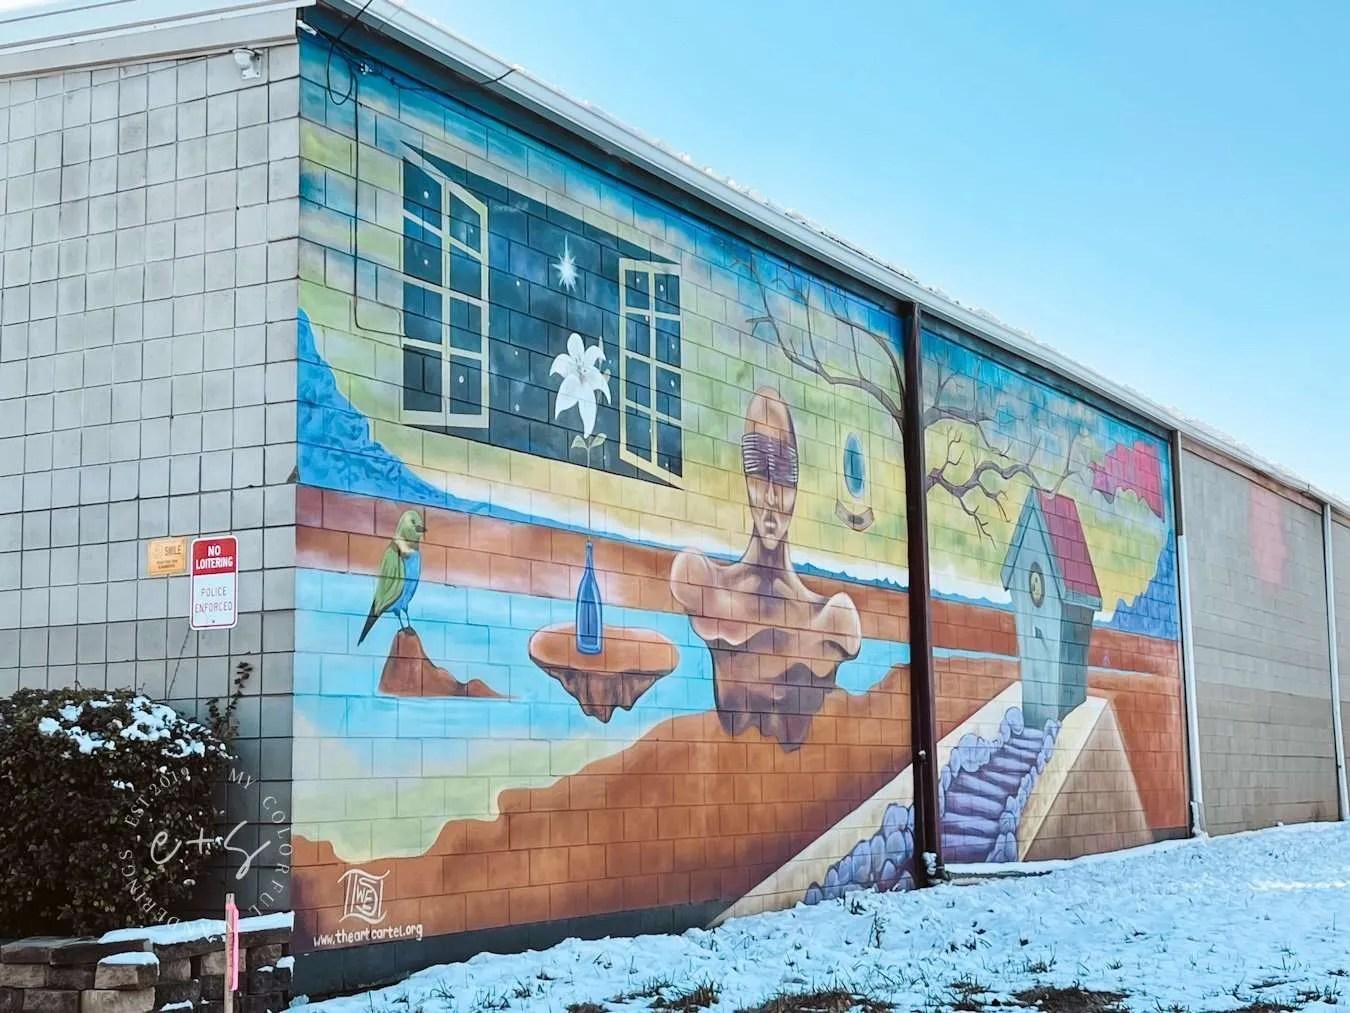 Trippy Dreams Mural - Louisville The Art Cartel Murals